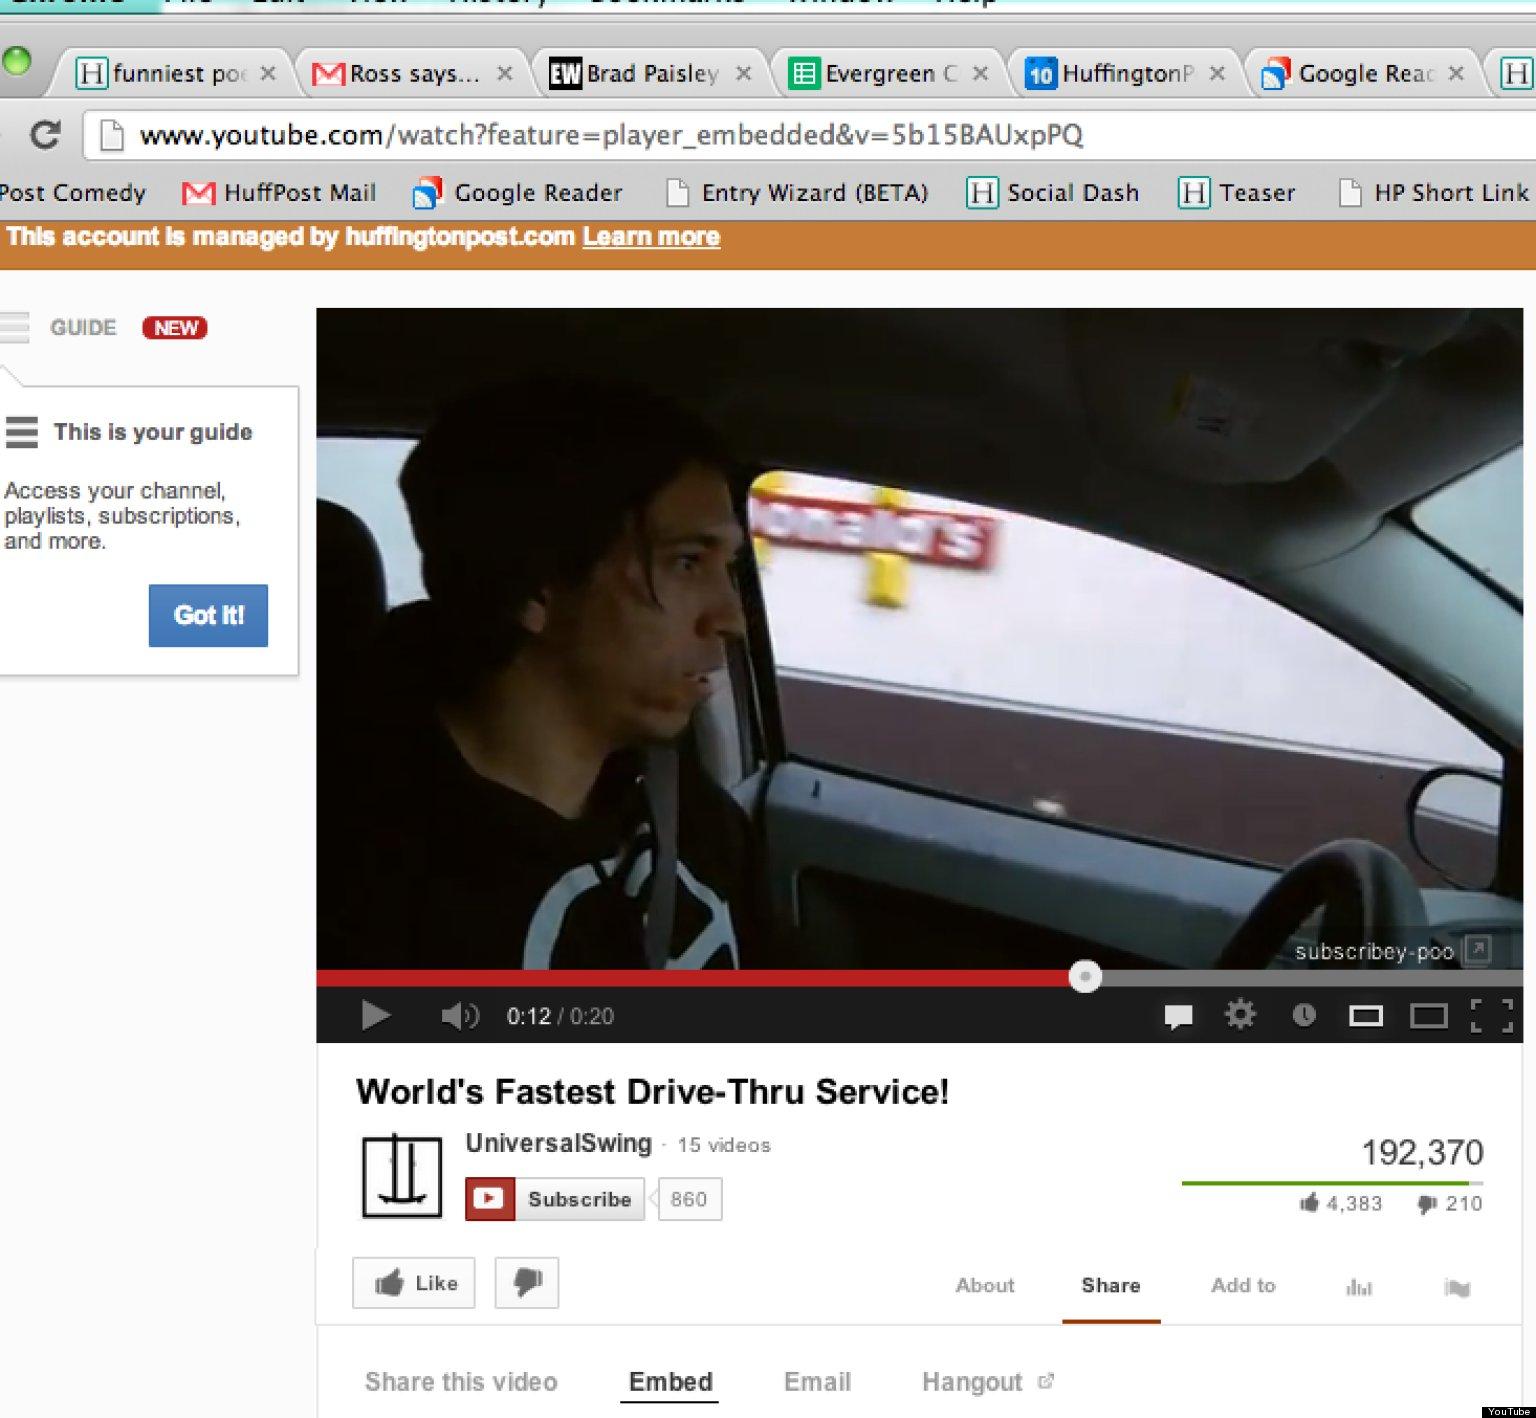 World's Fastest Drive-Thru Service? (VIDEO)